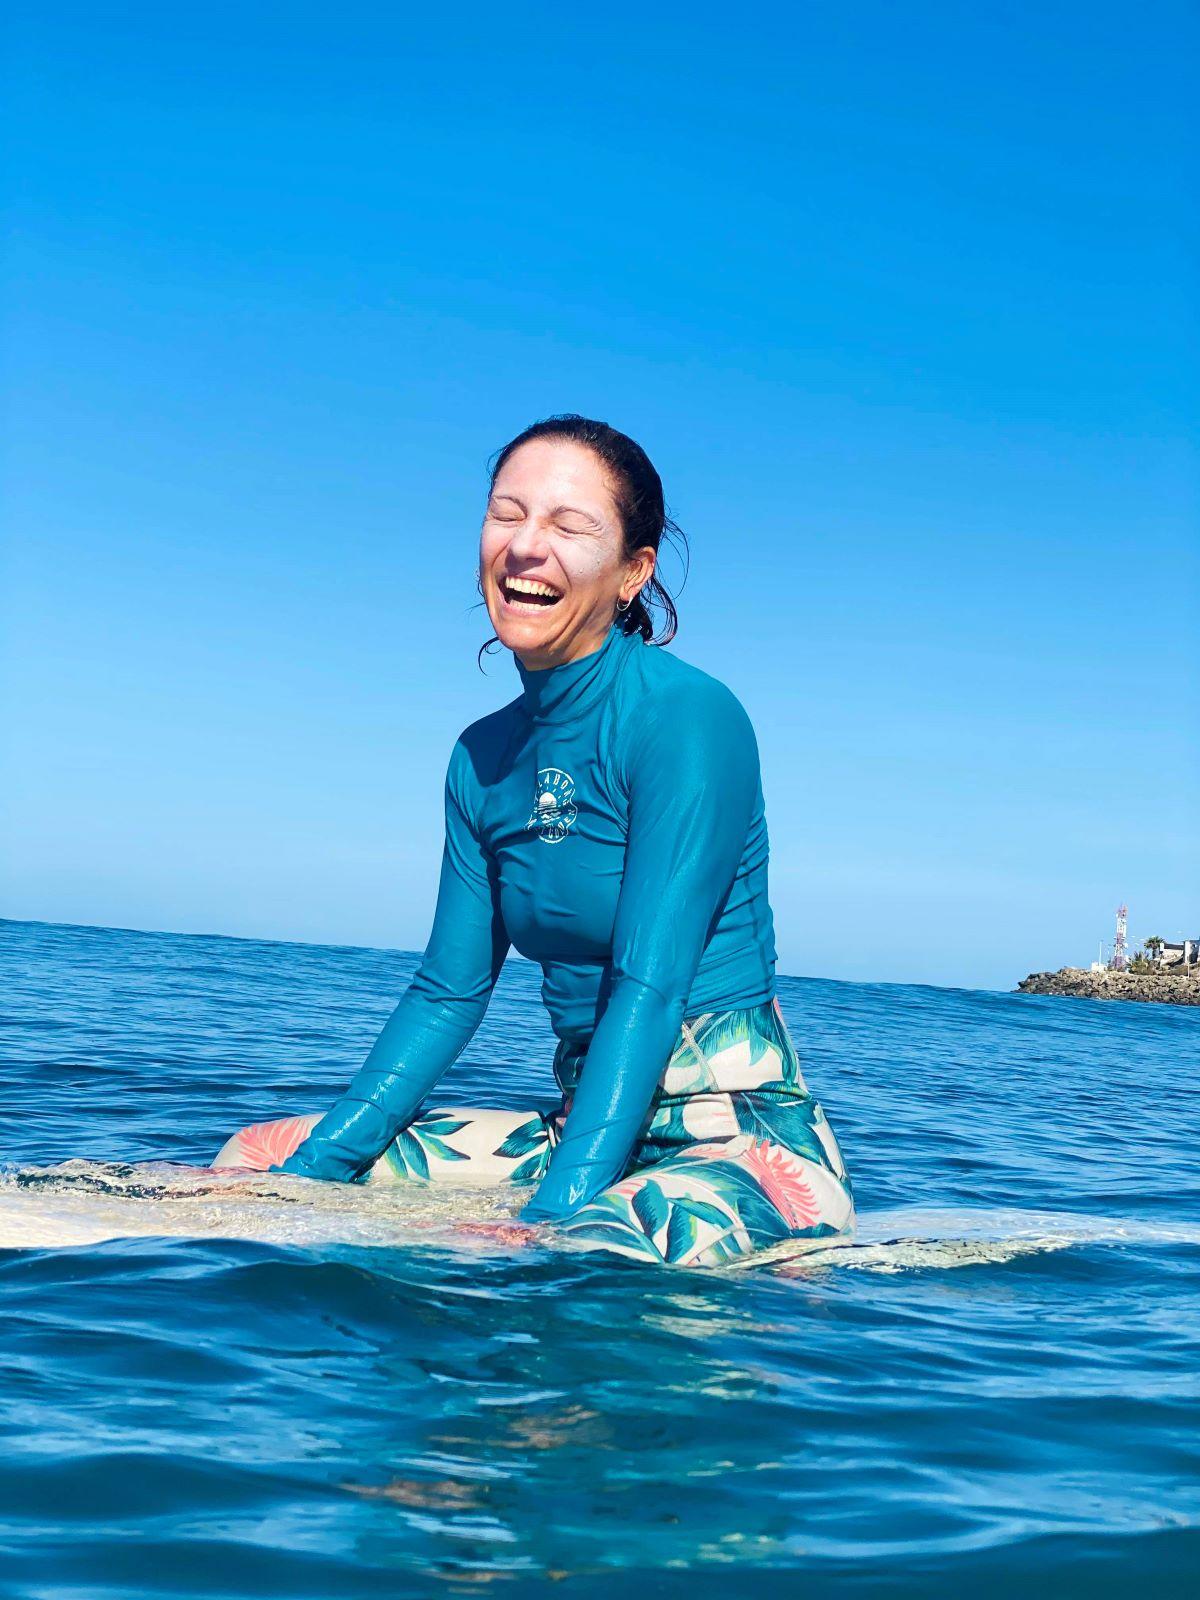 happy-surfer-guided-surf-trip-surf-camp-las-palmas